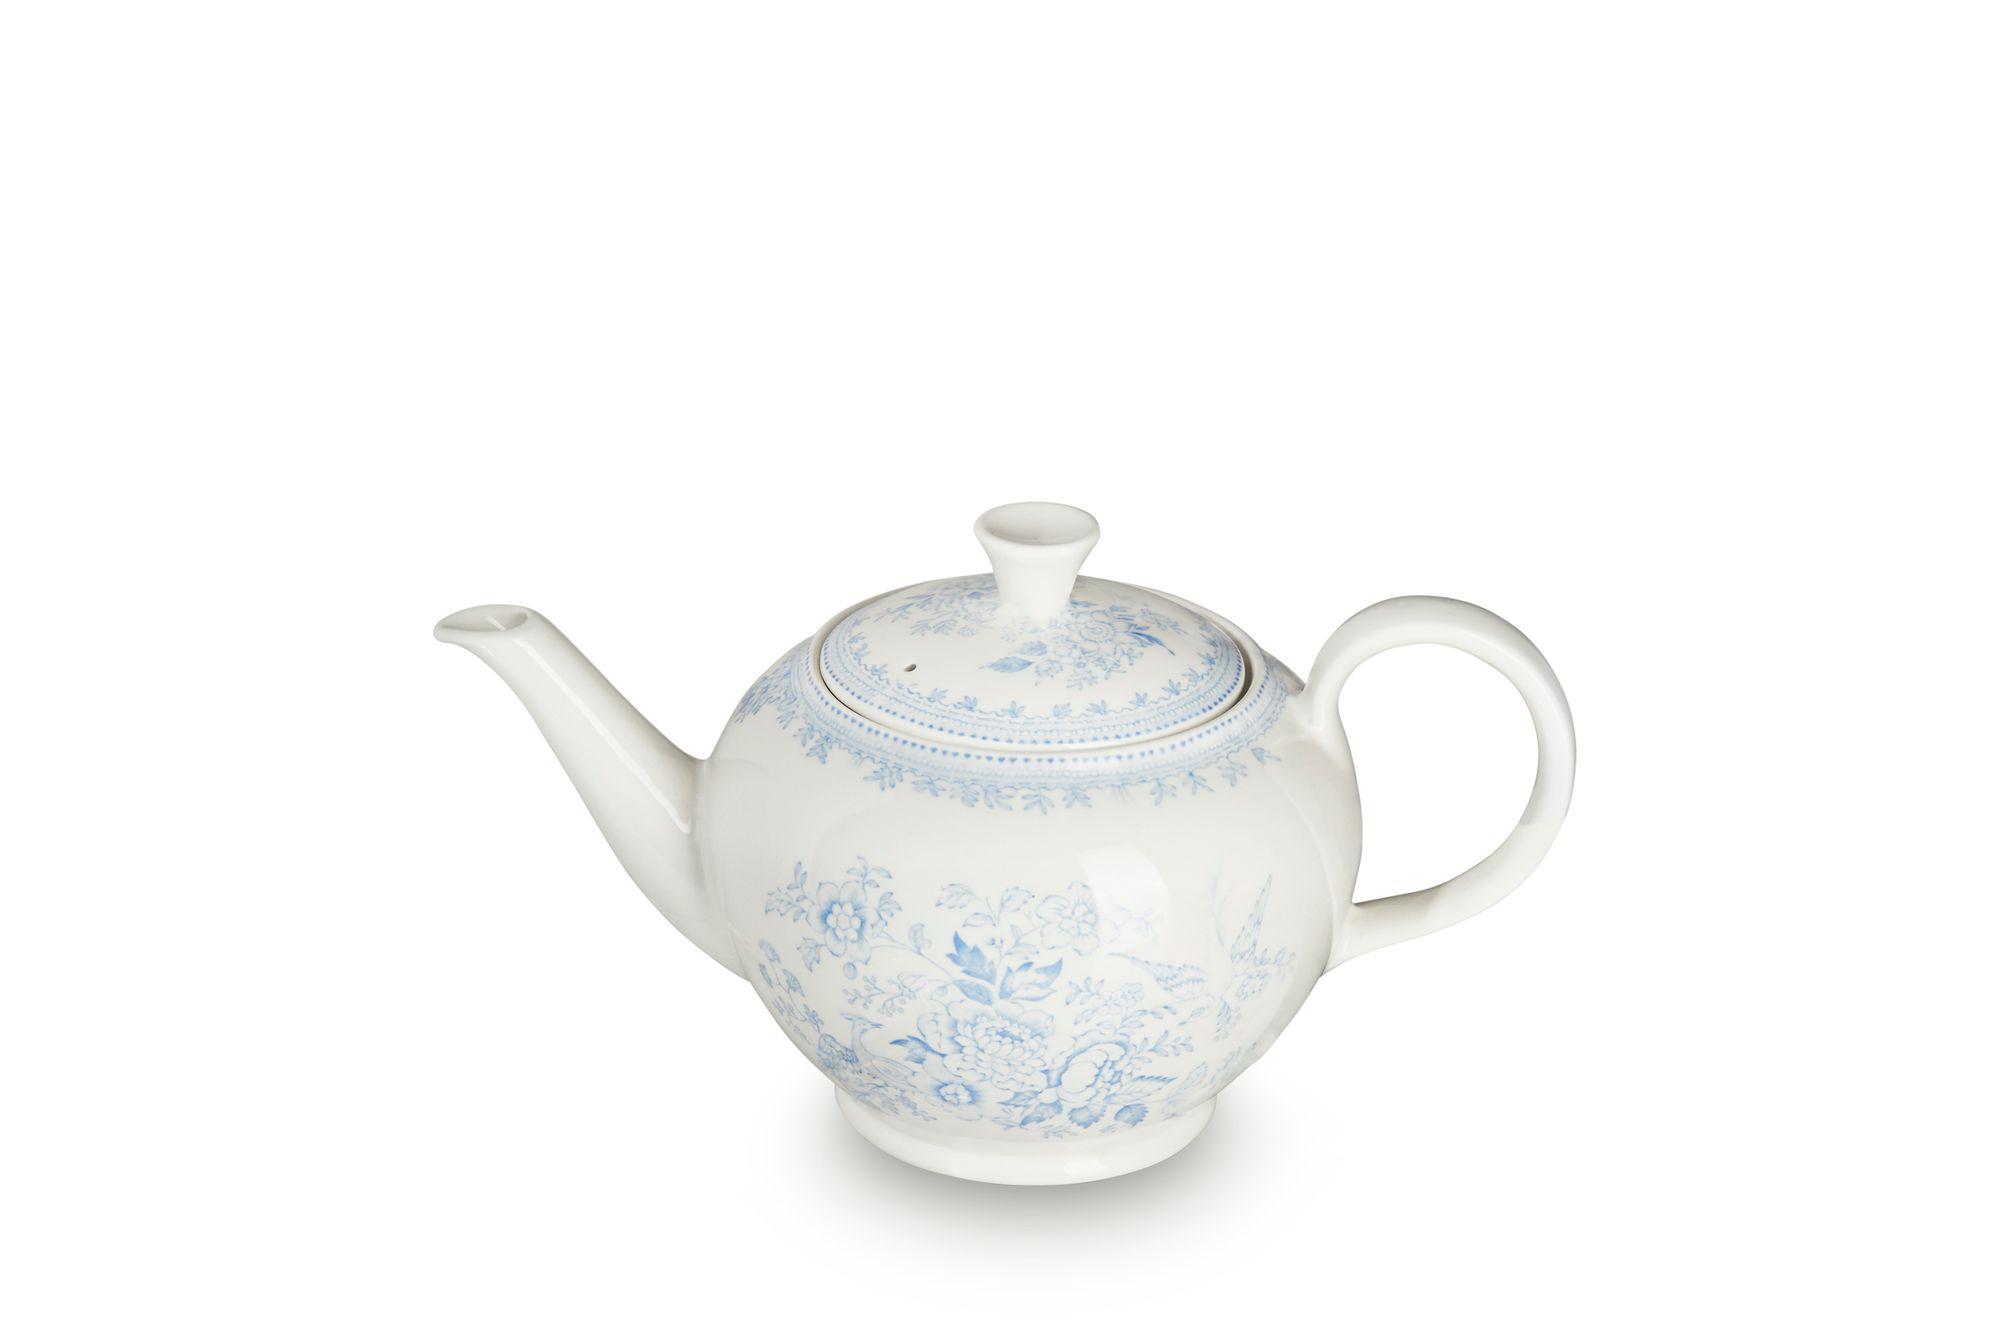 Burleigh Blue Asiatic Pheasants Teapot 1 3/4pt thumb 3